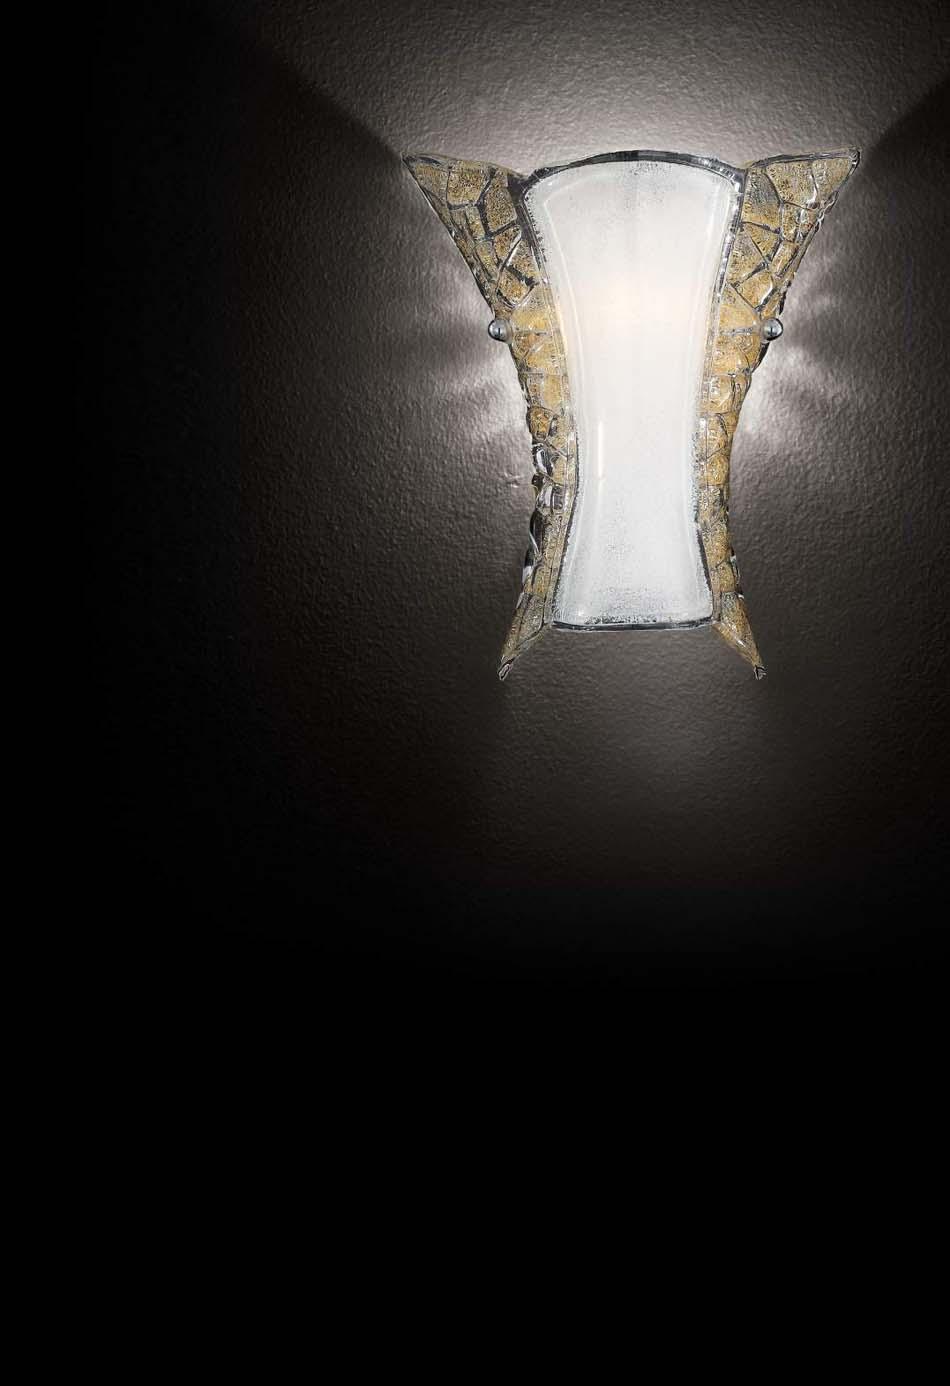 Lampade 11 parete soffitto Ideal Lux Ape – Bruni Arredamenti